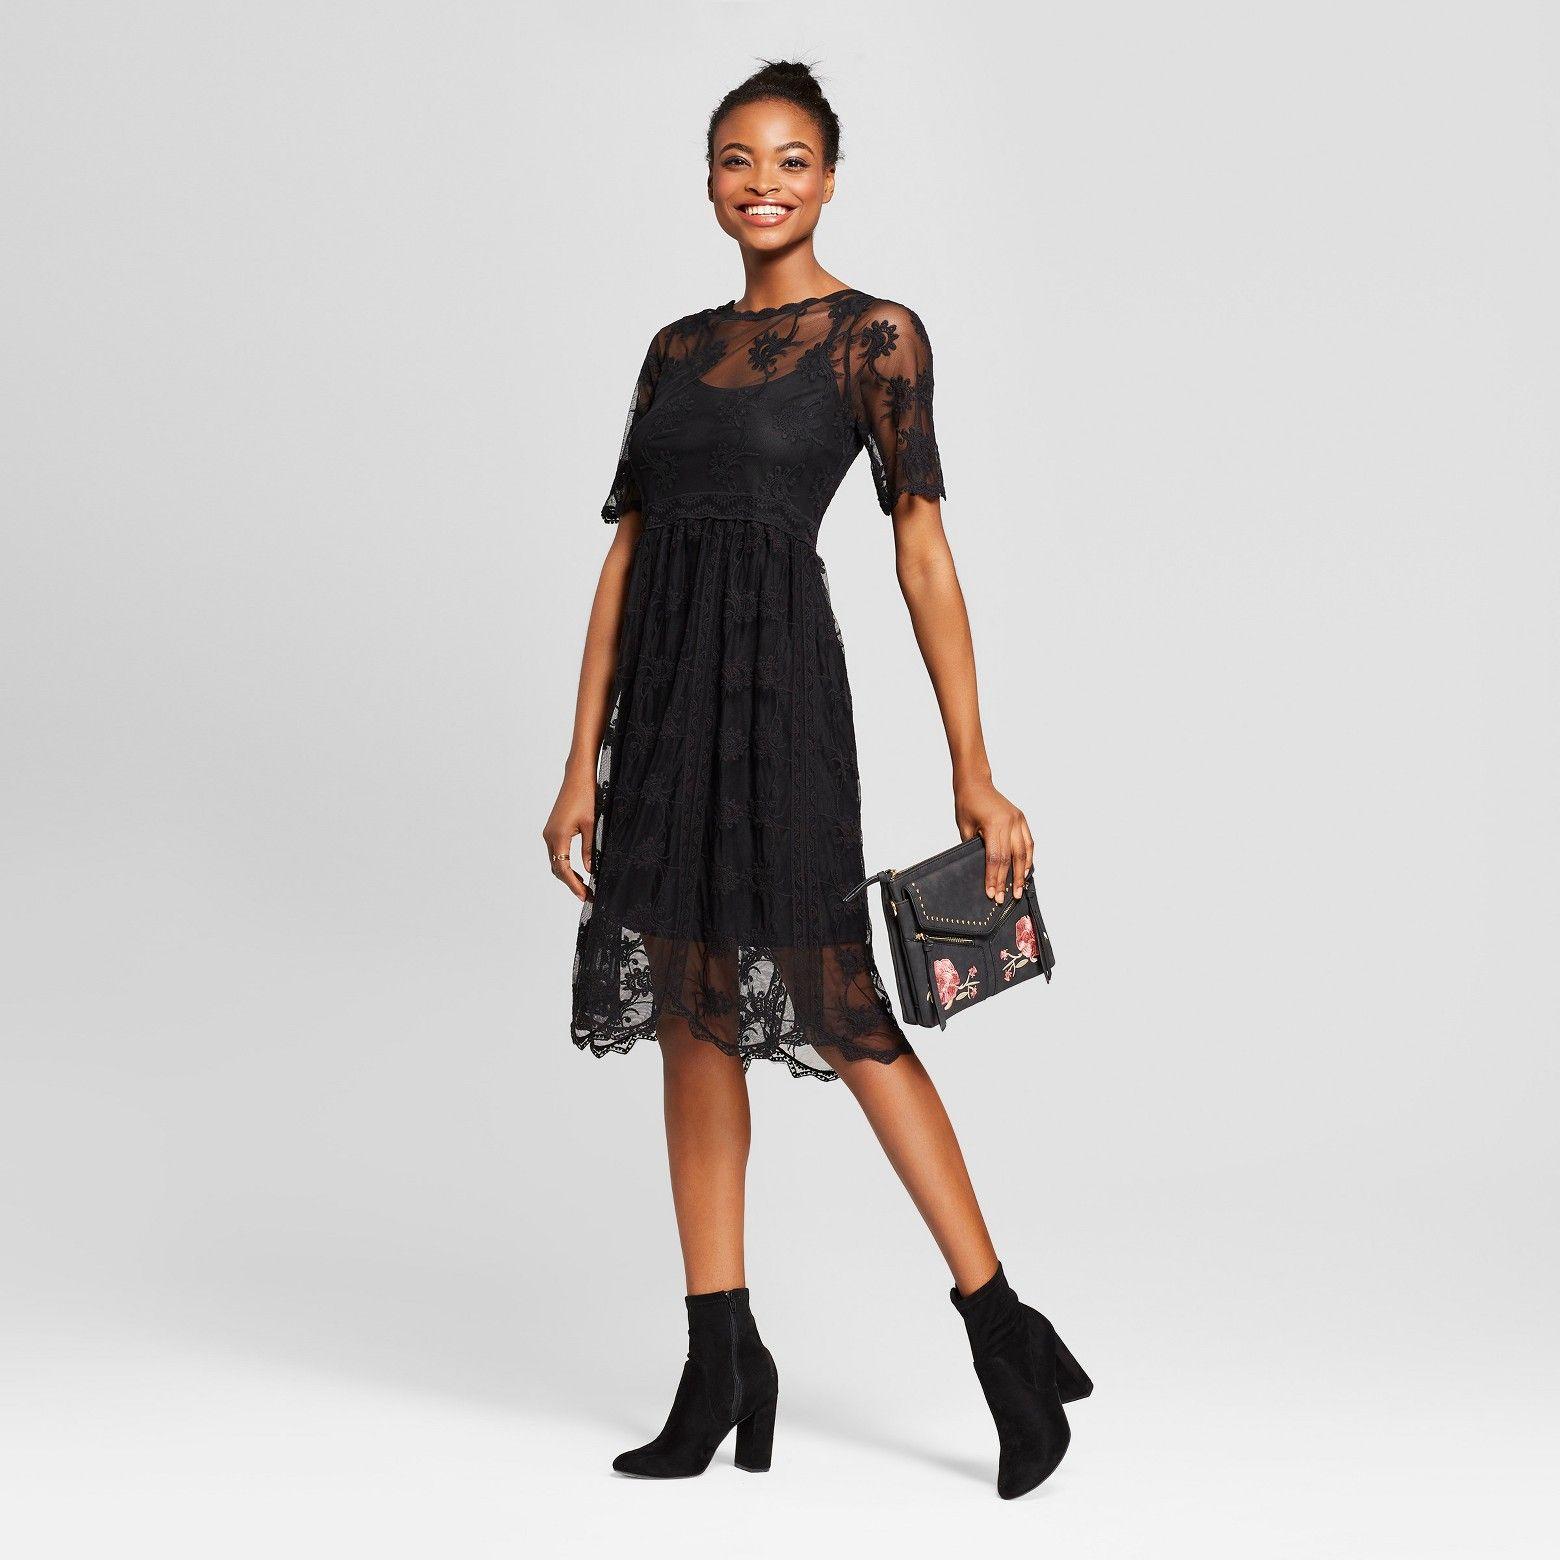 Women S Embroidered Mesh Midi Dress Xhilaration Black L Target Dresses Midi Dress Lace Midi Dress [ 1560 x 1560 Pixel ]